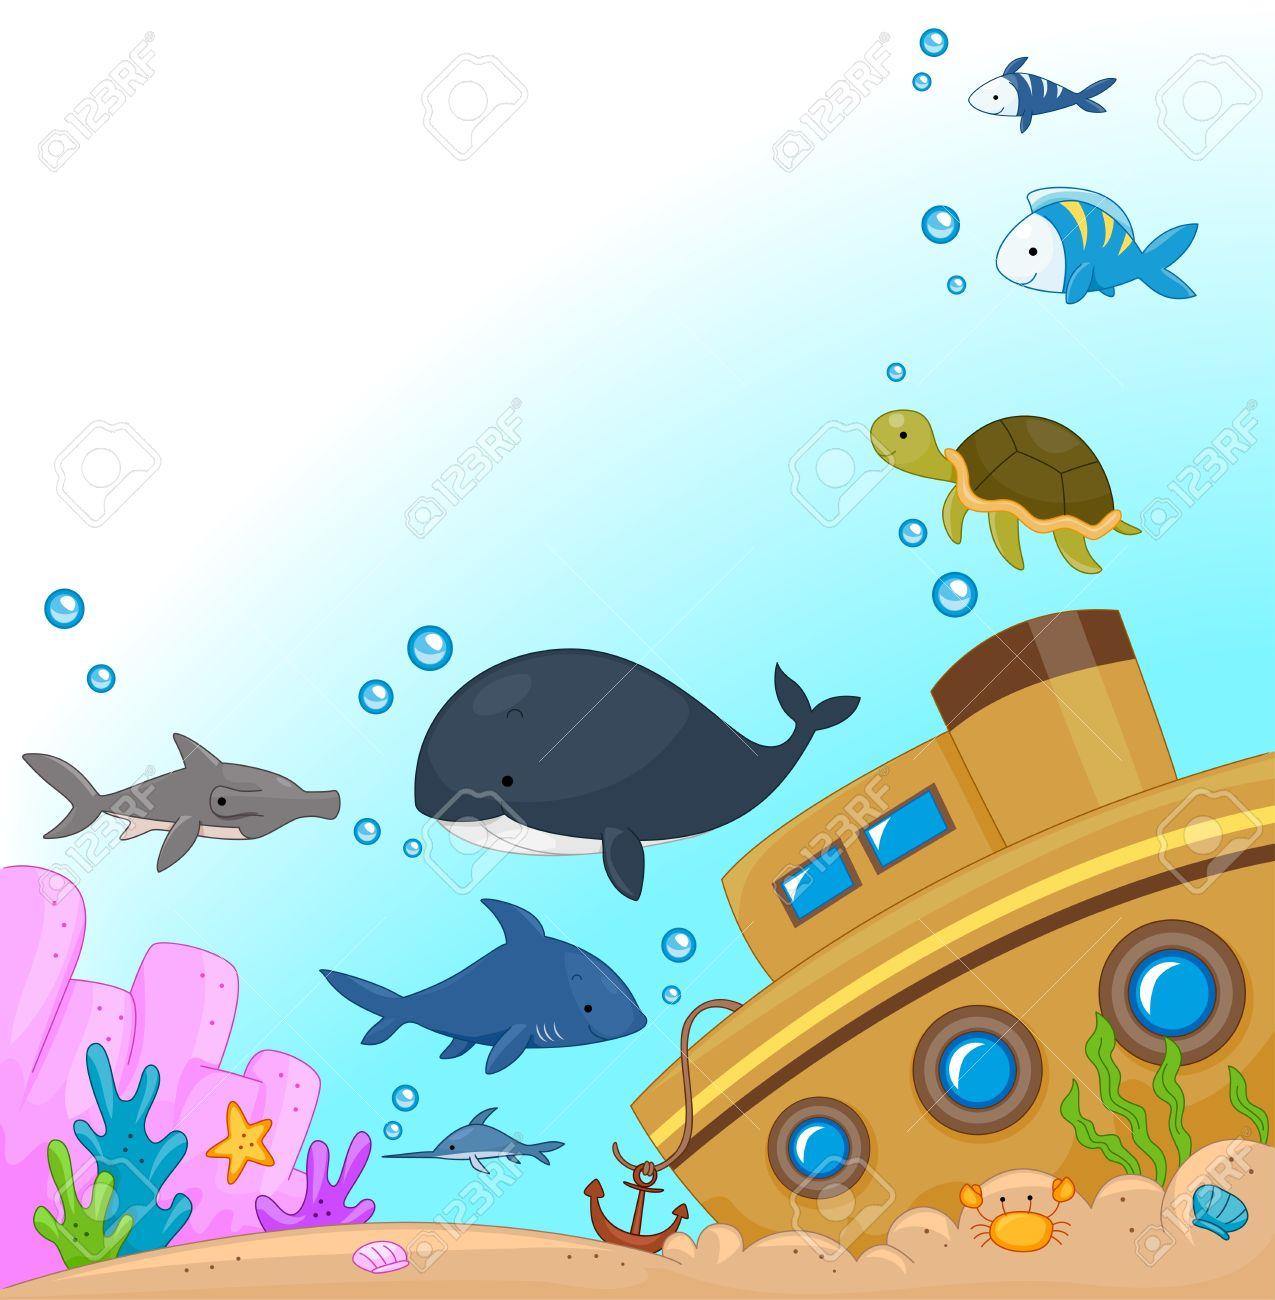 Illustration of Animals Under the Sea Stock Illustration - 9670349